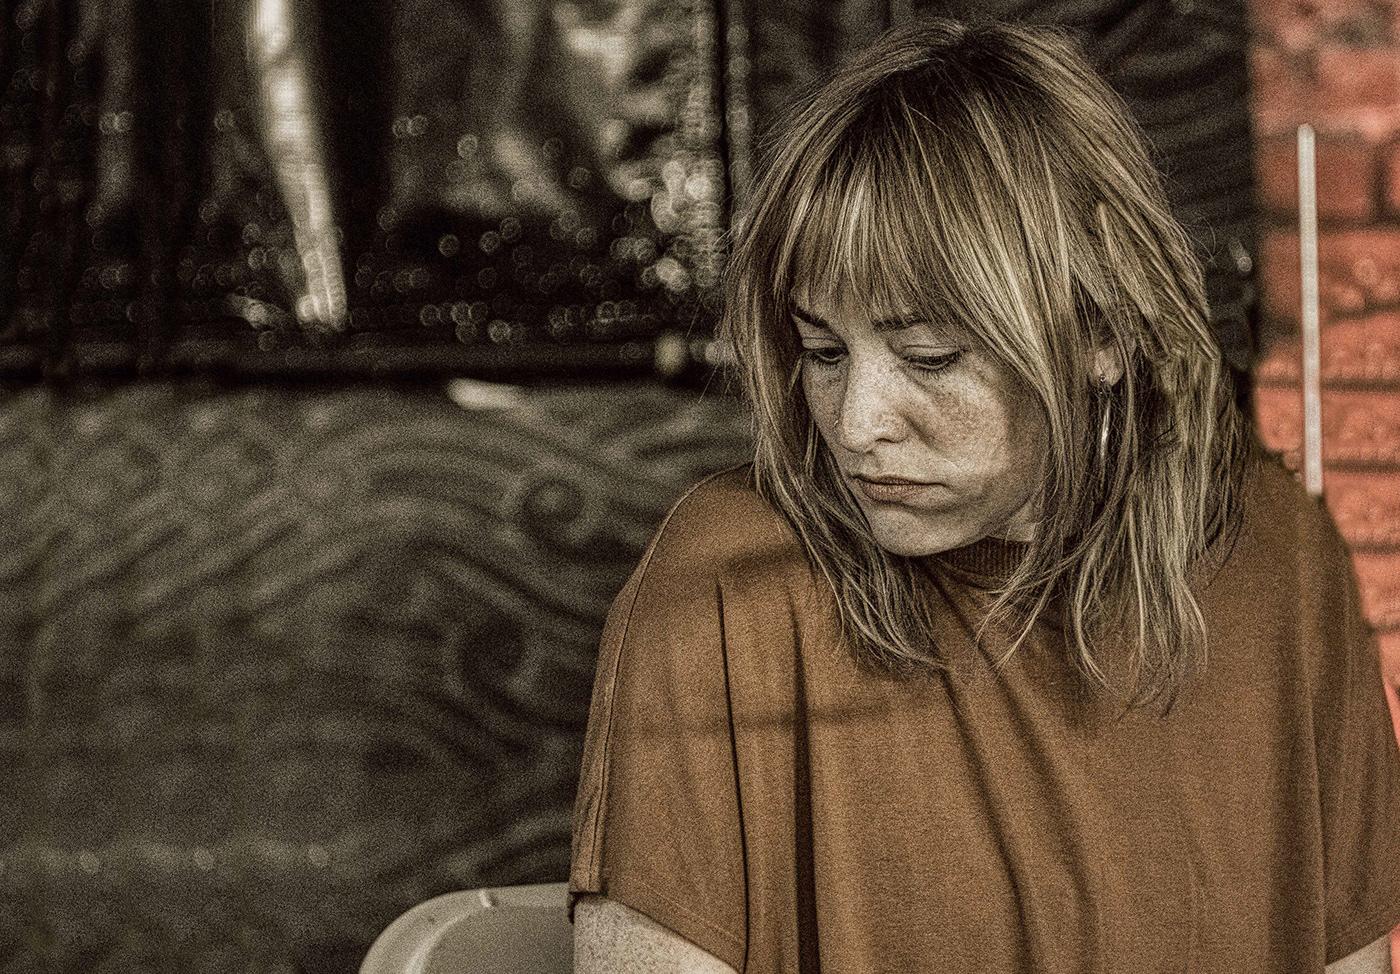 bands festivals guitarists musicians portraits profiles singers songwriters concert